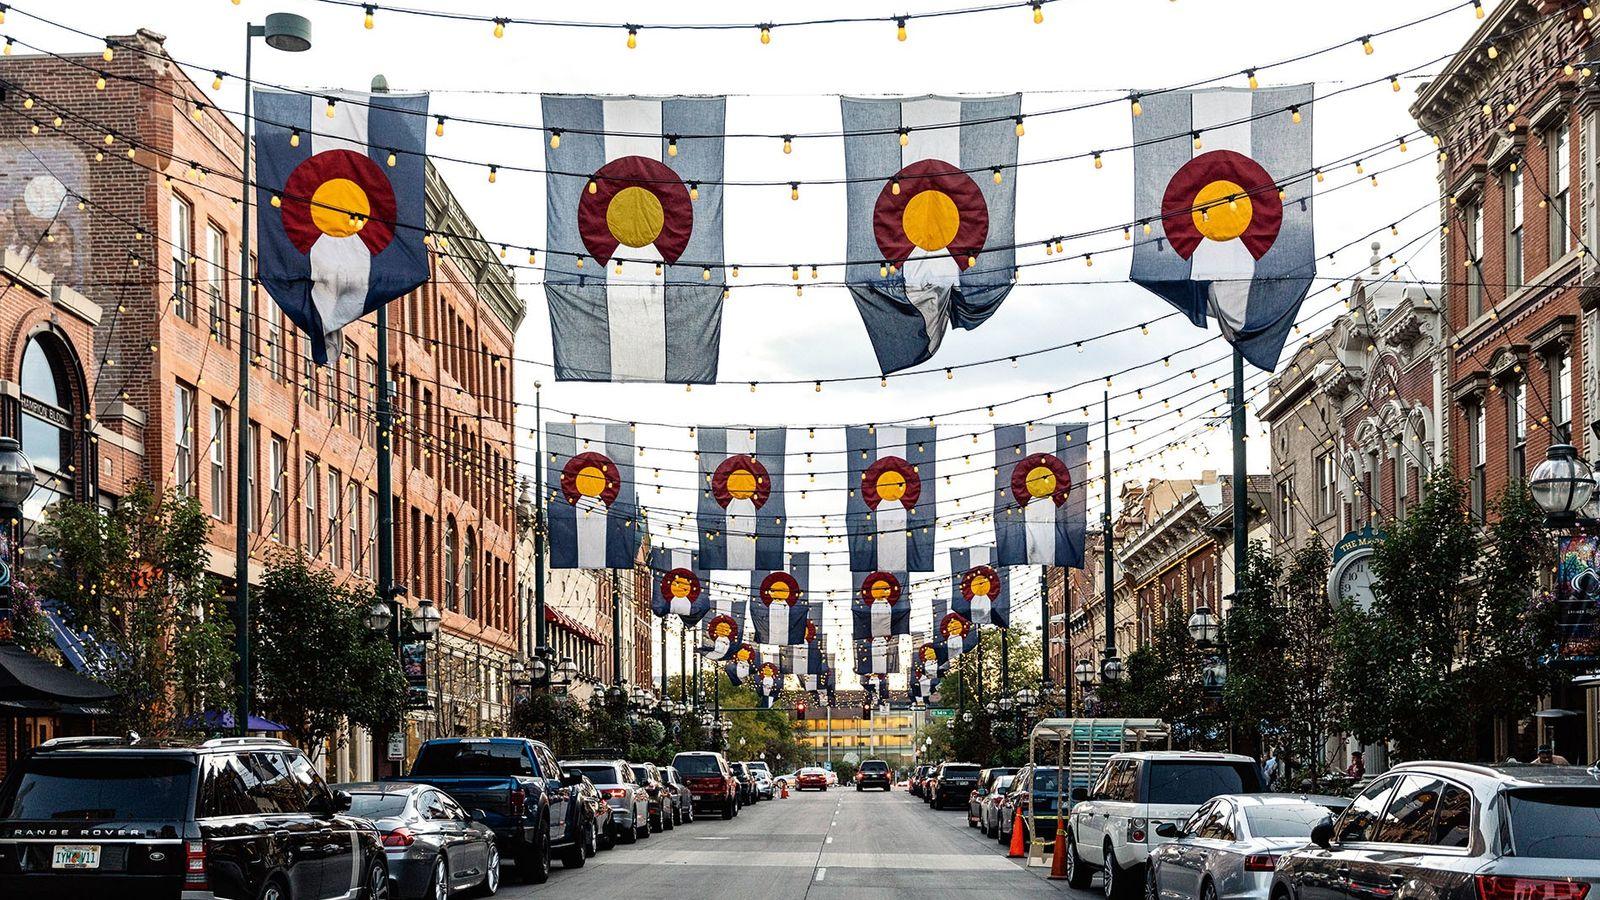 Flags fly over Denver's historic Larimer Square.